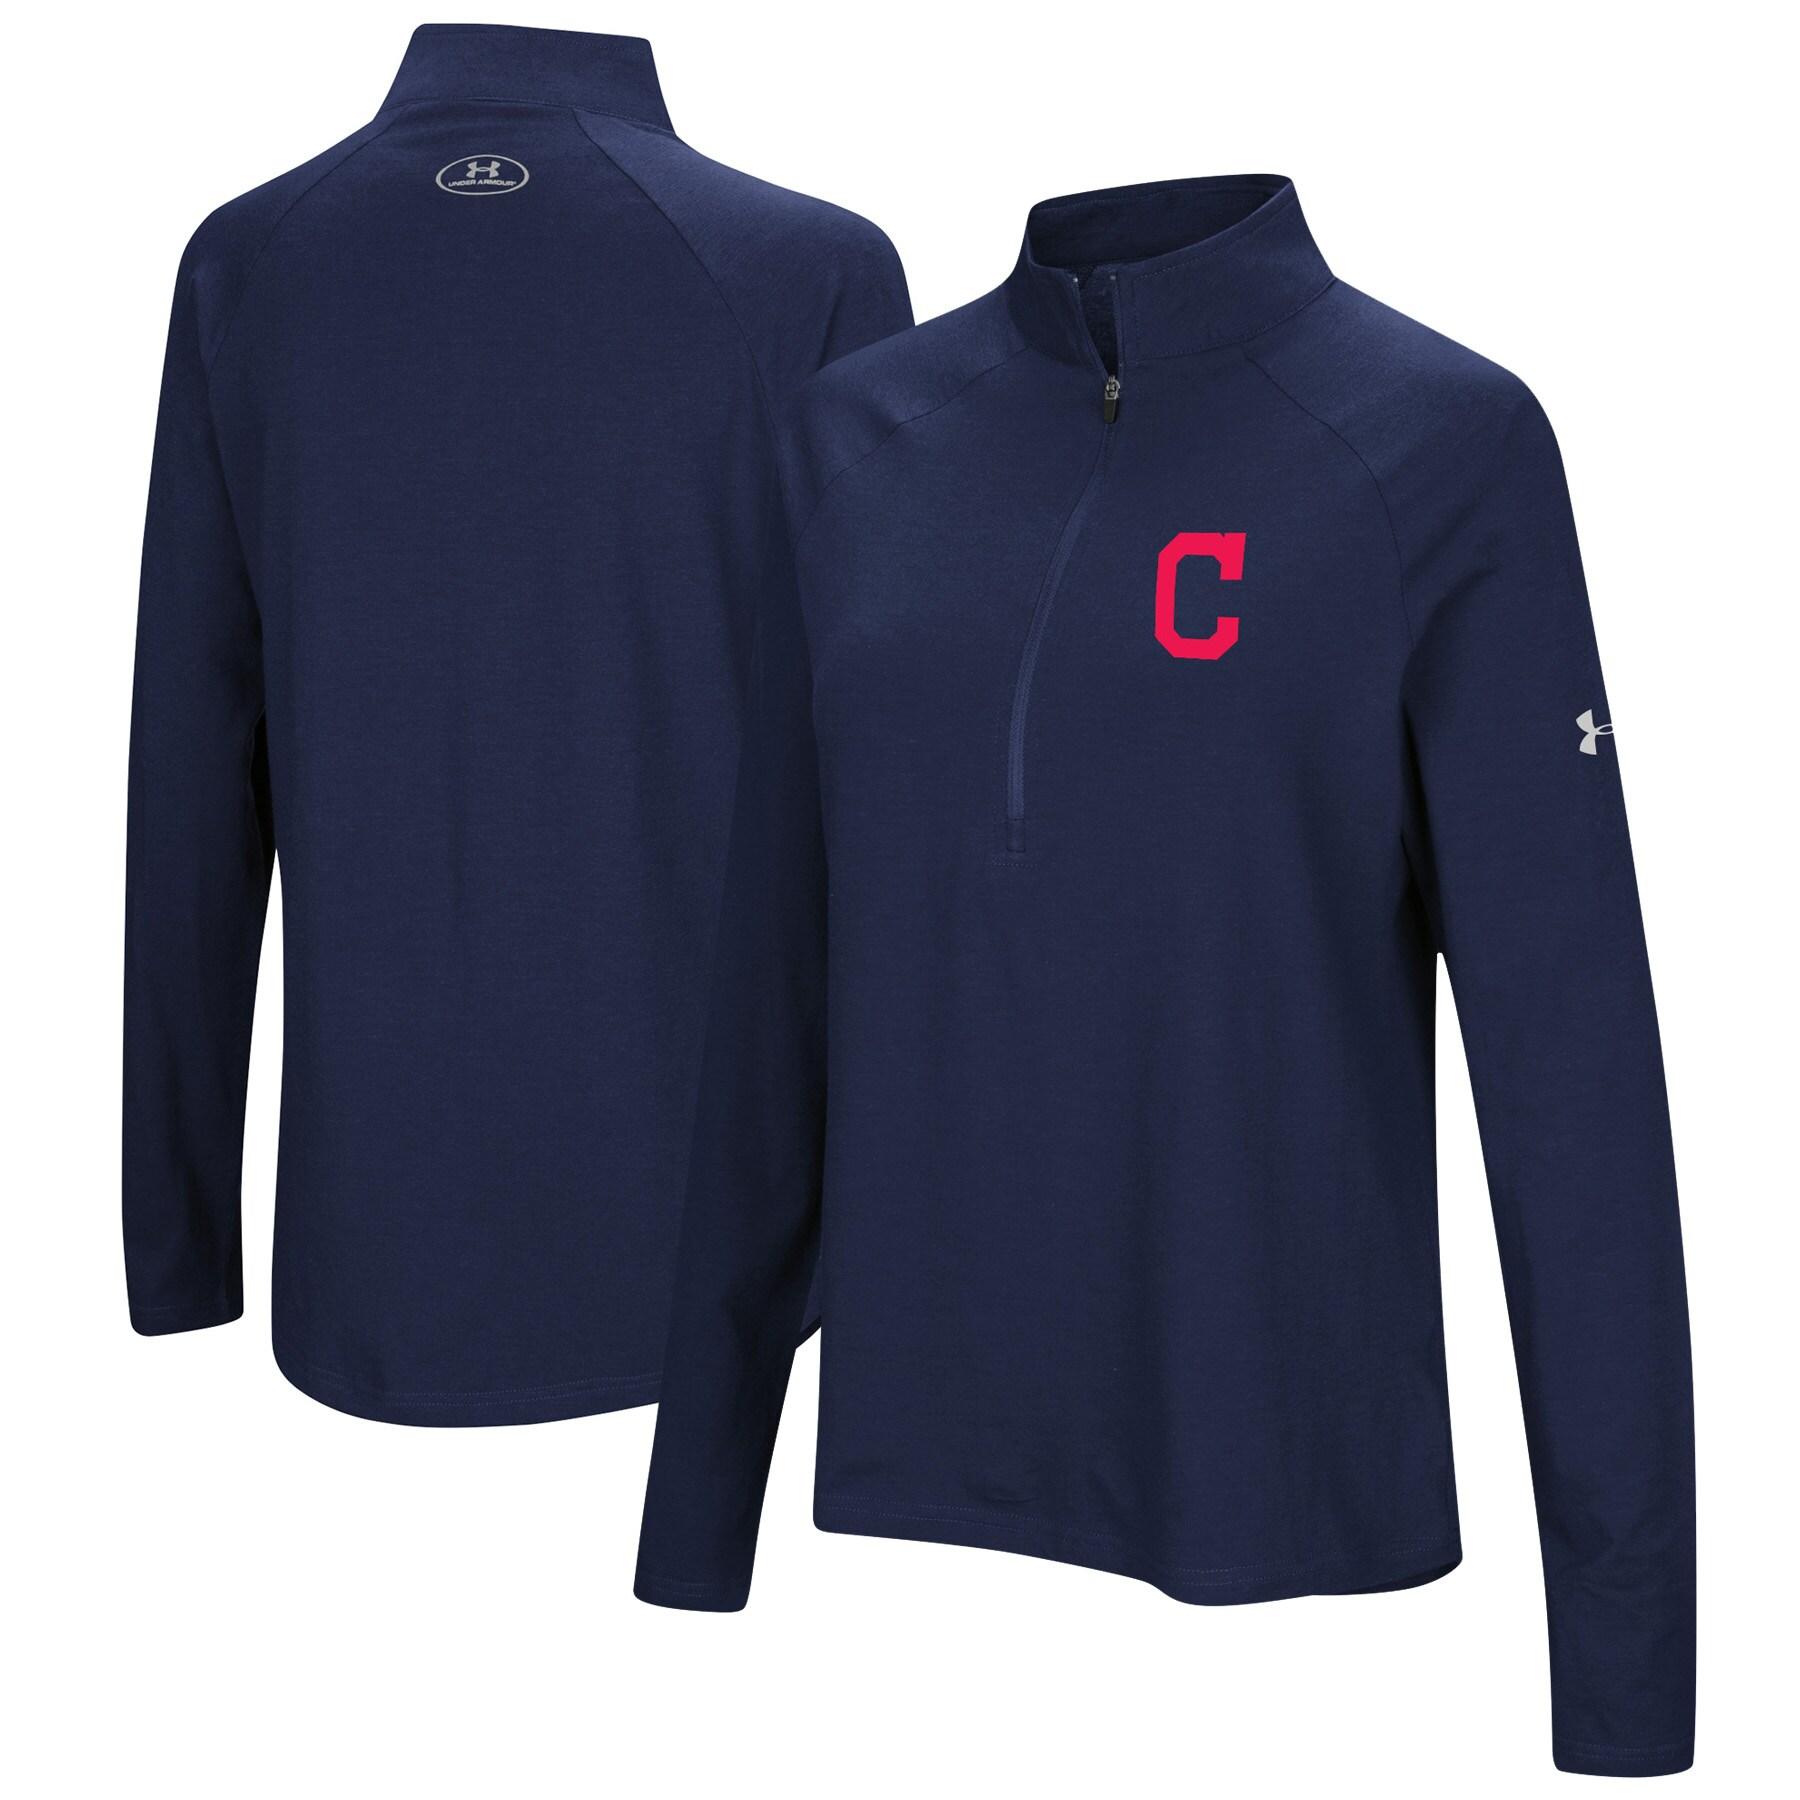 Cleveland Indians Under Armour Women's Passion Performance Tri-Blend Raglan Half-Zip Pullover Jacket - Navy